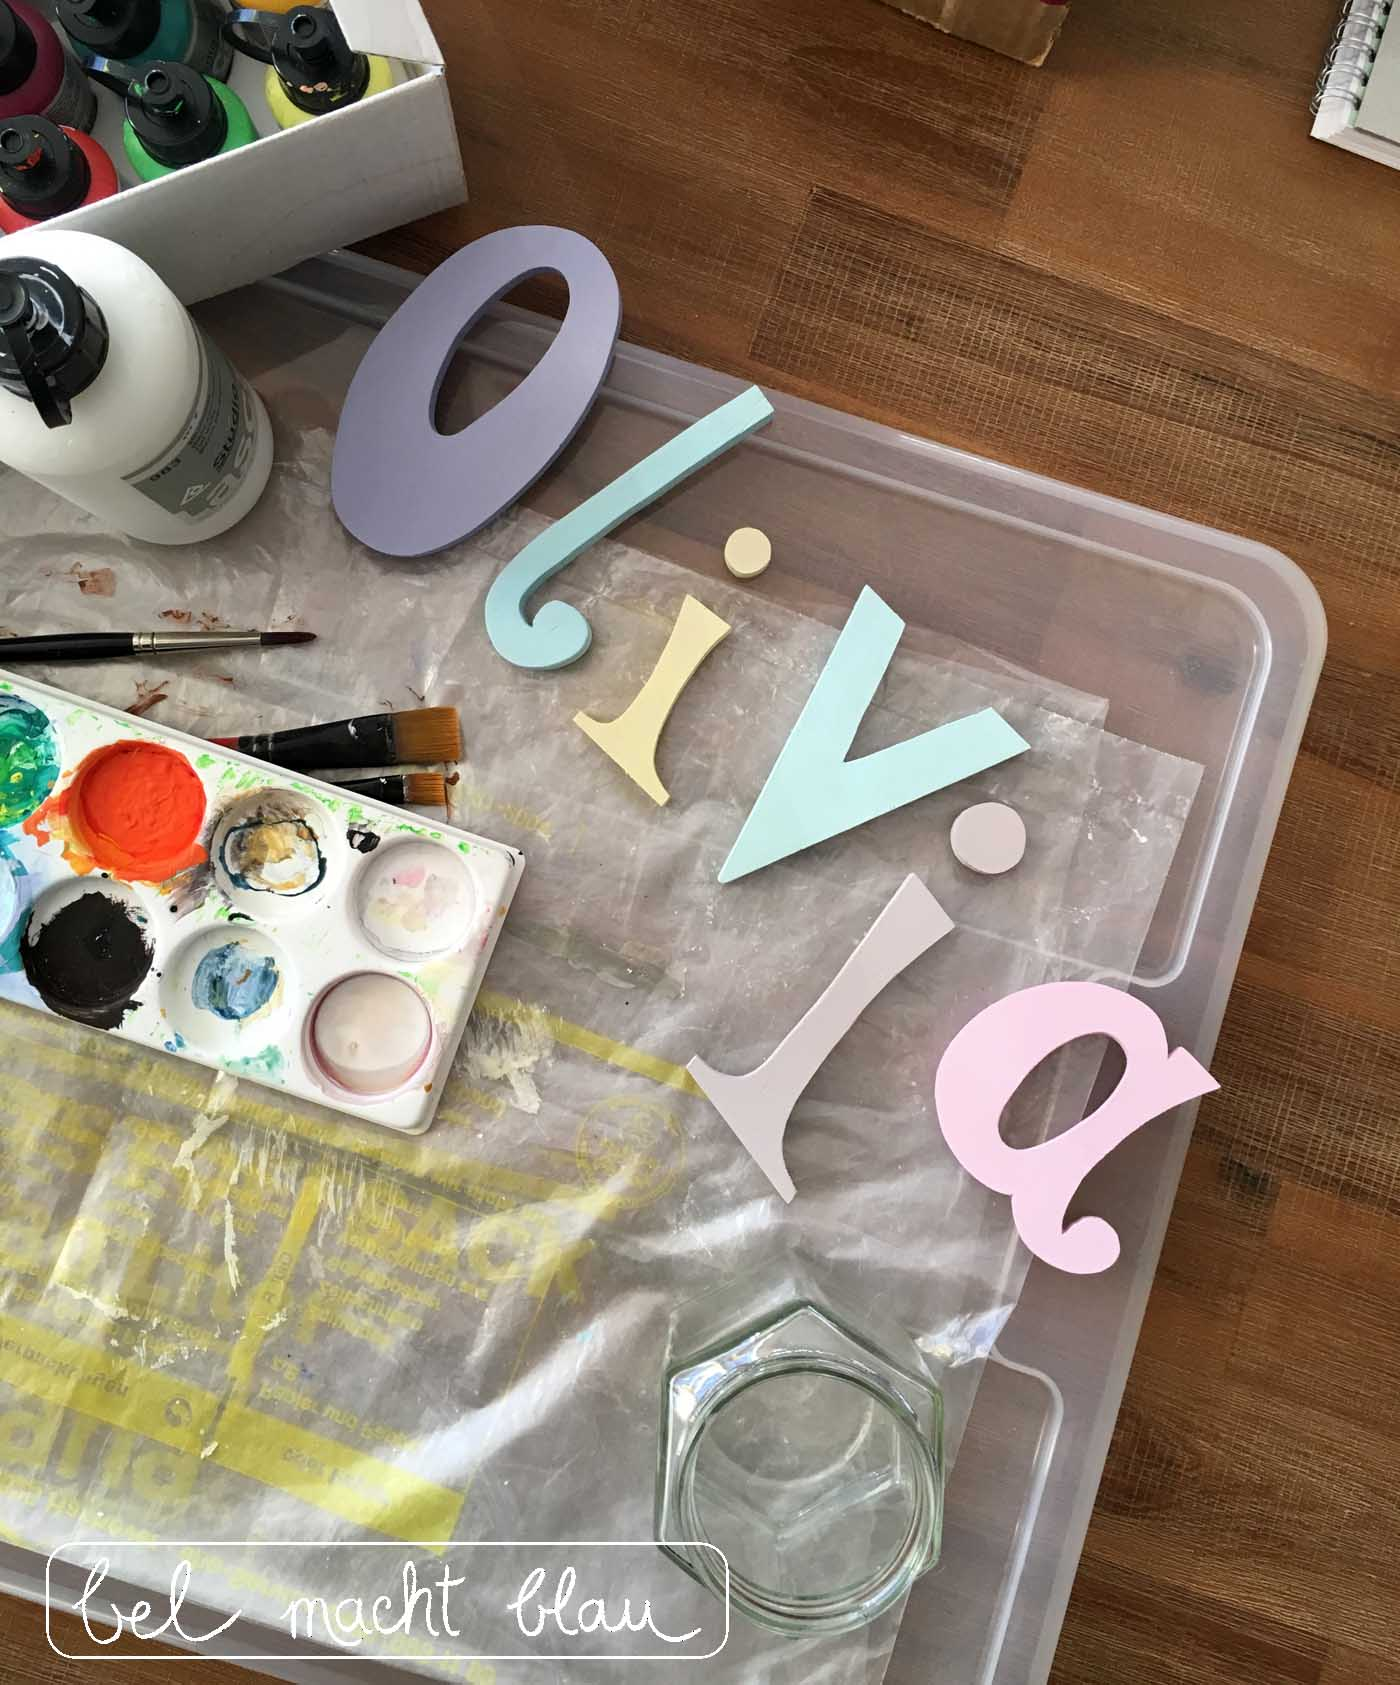 Olivia - Holzbuchstaben selbst sägen und bemalen